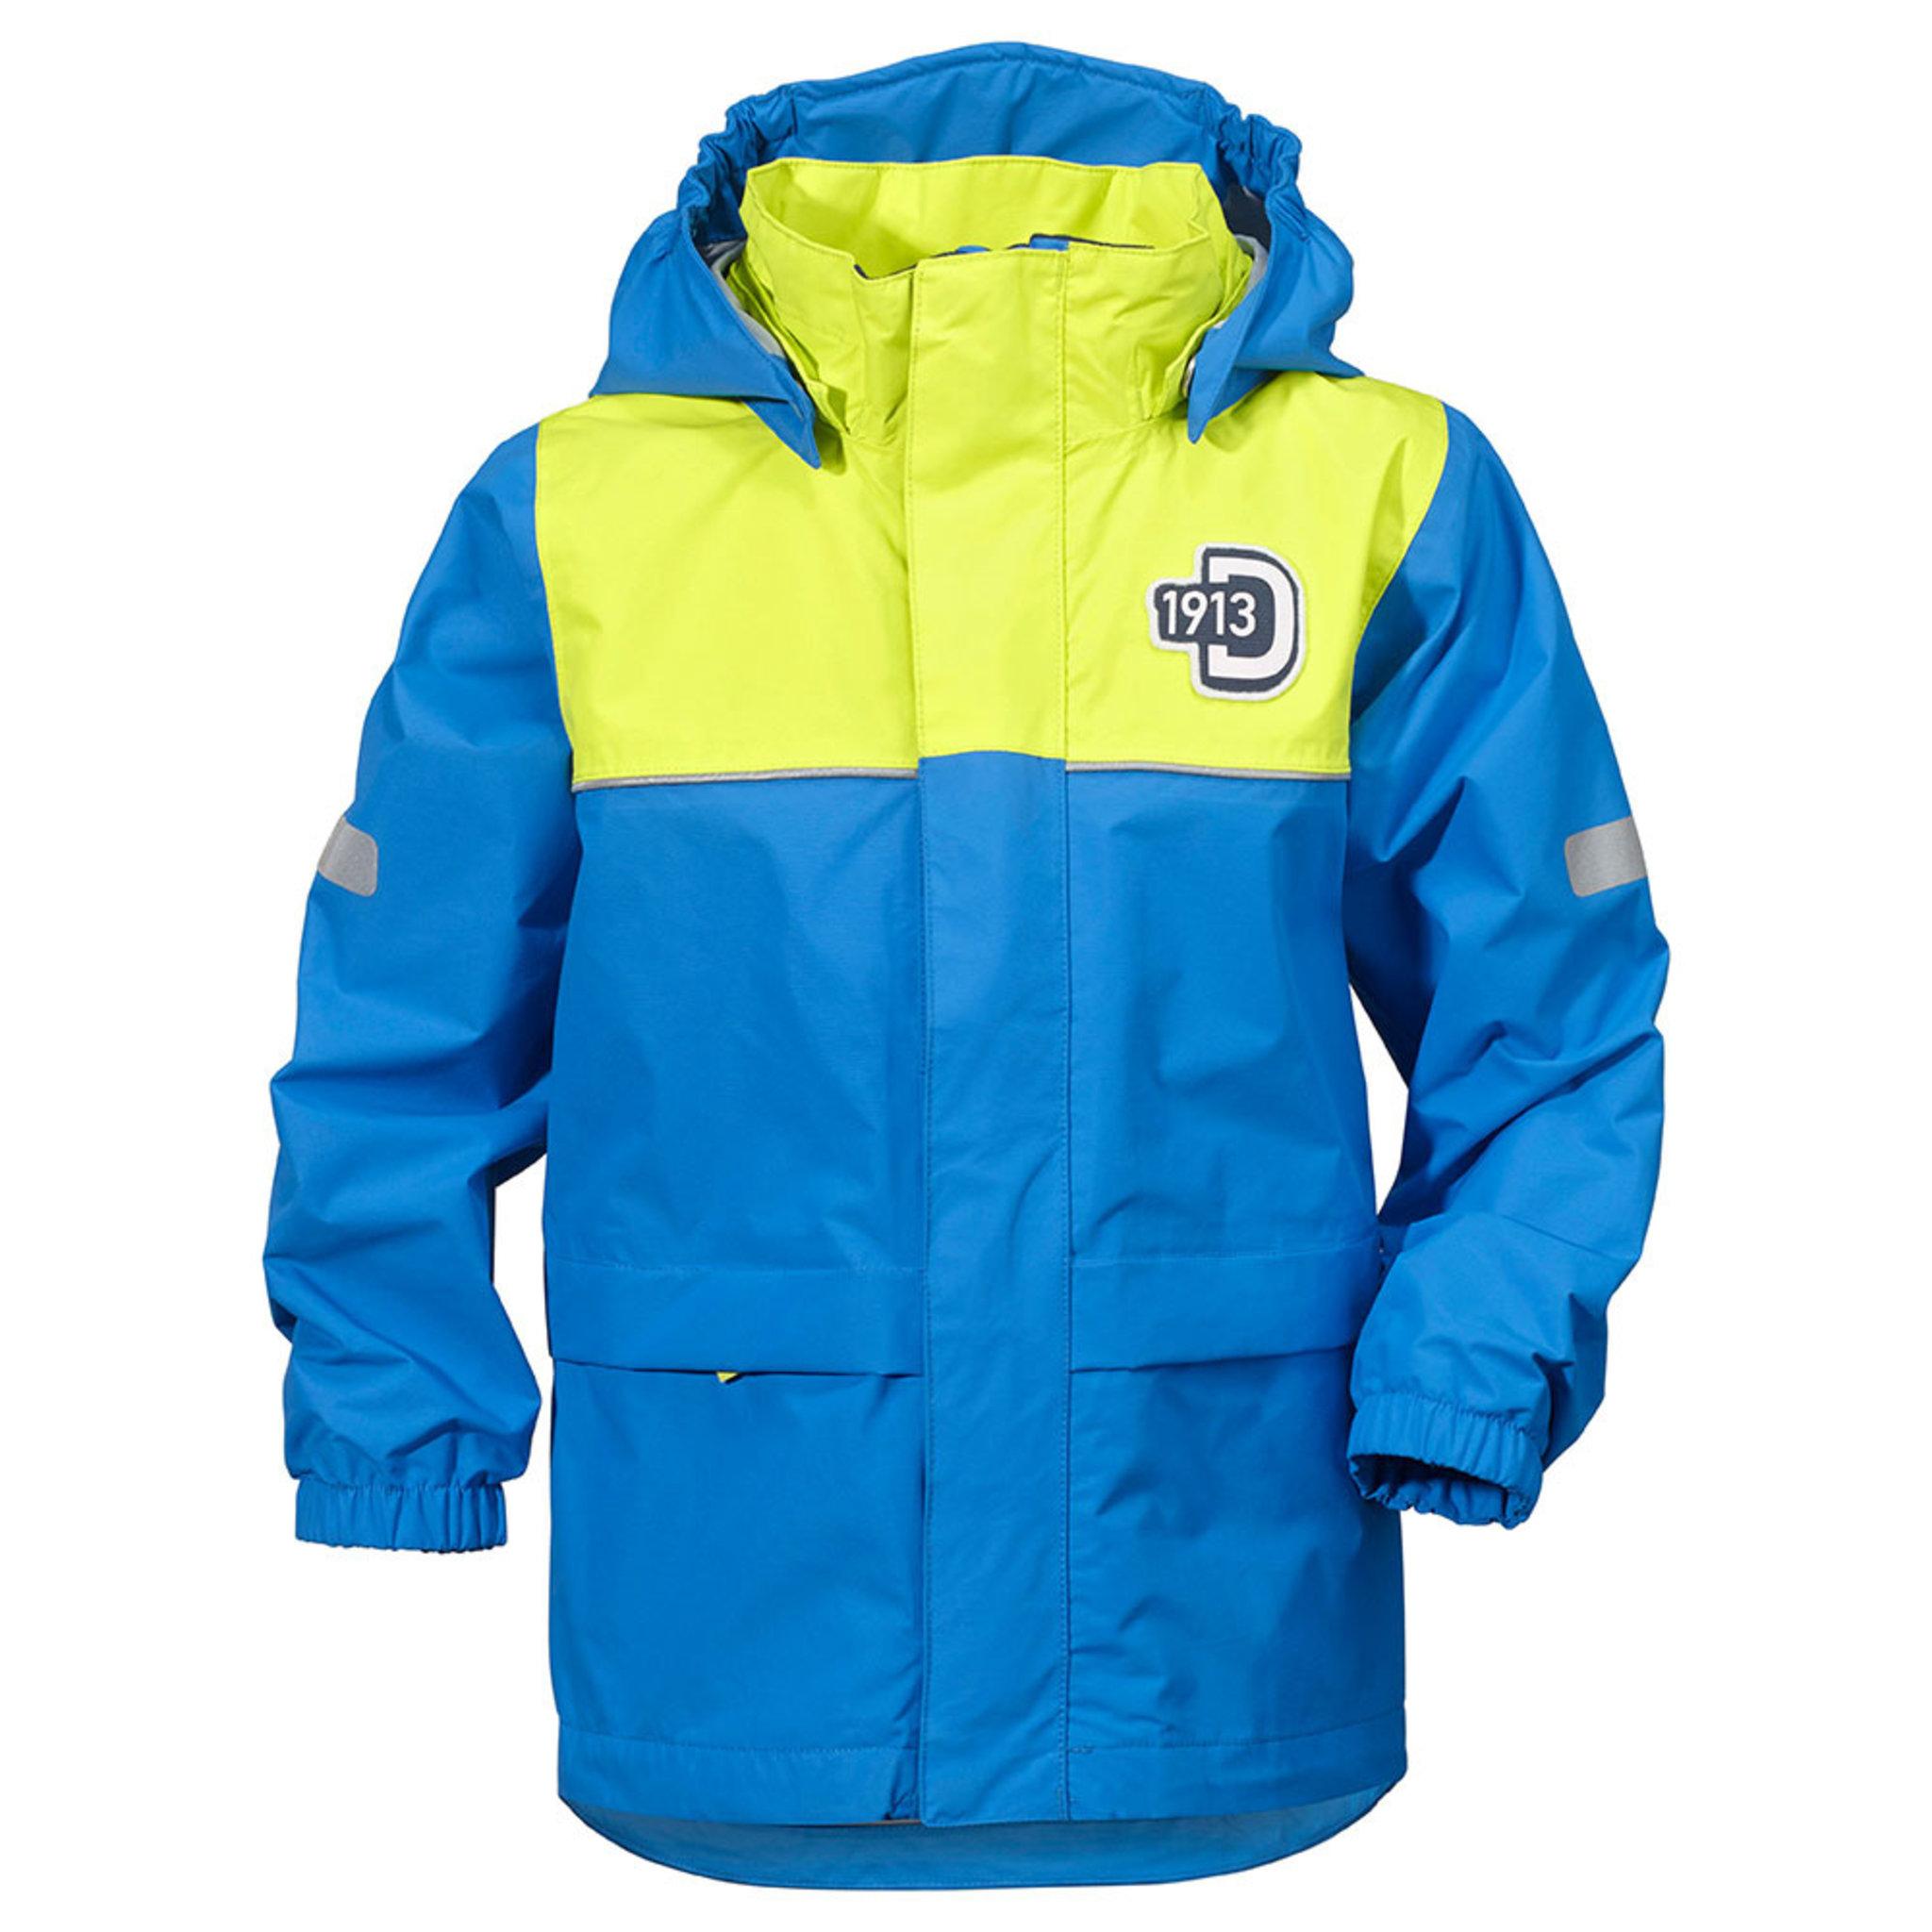 c1e340b9 Jacka Jezeri - Ytterkläder & regnkläder - Köp online på åhlens.se!